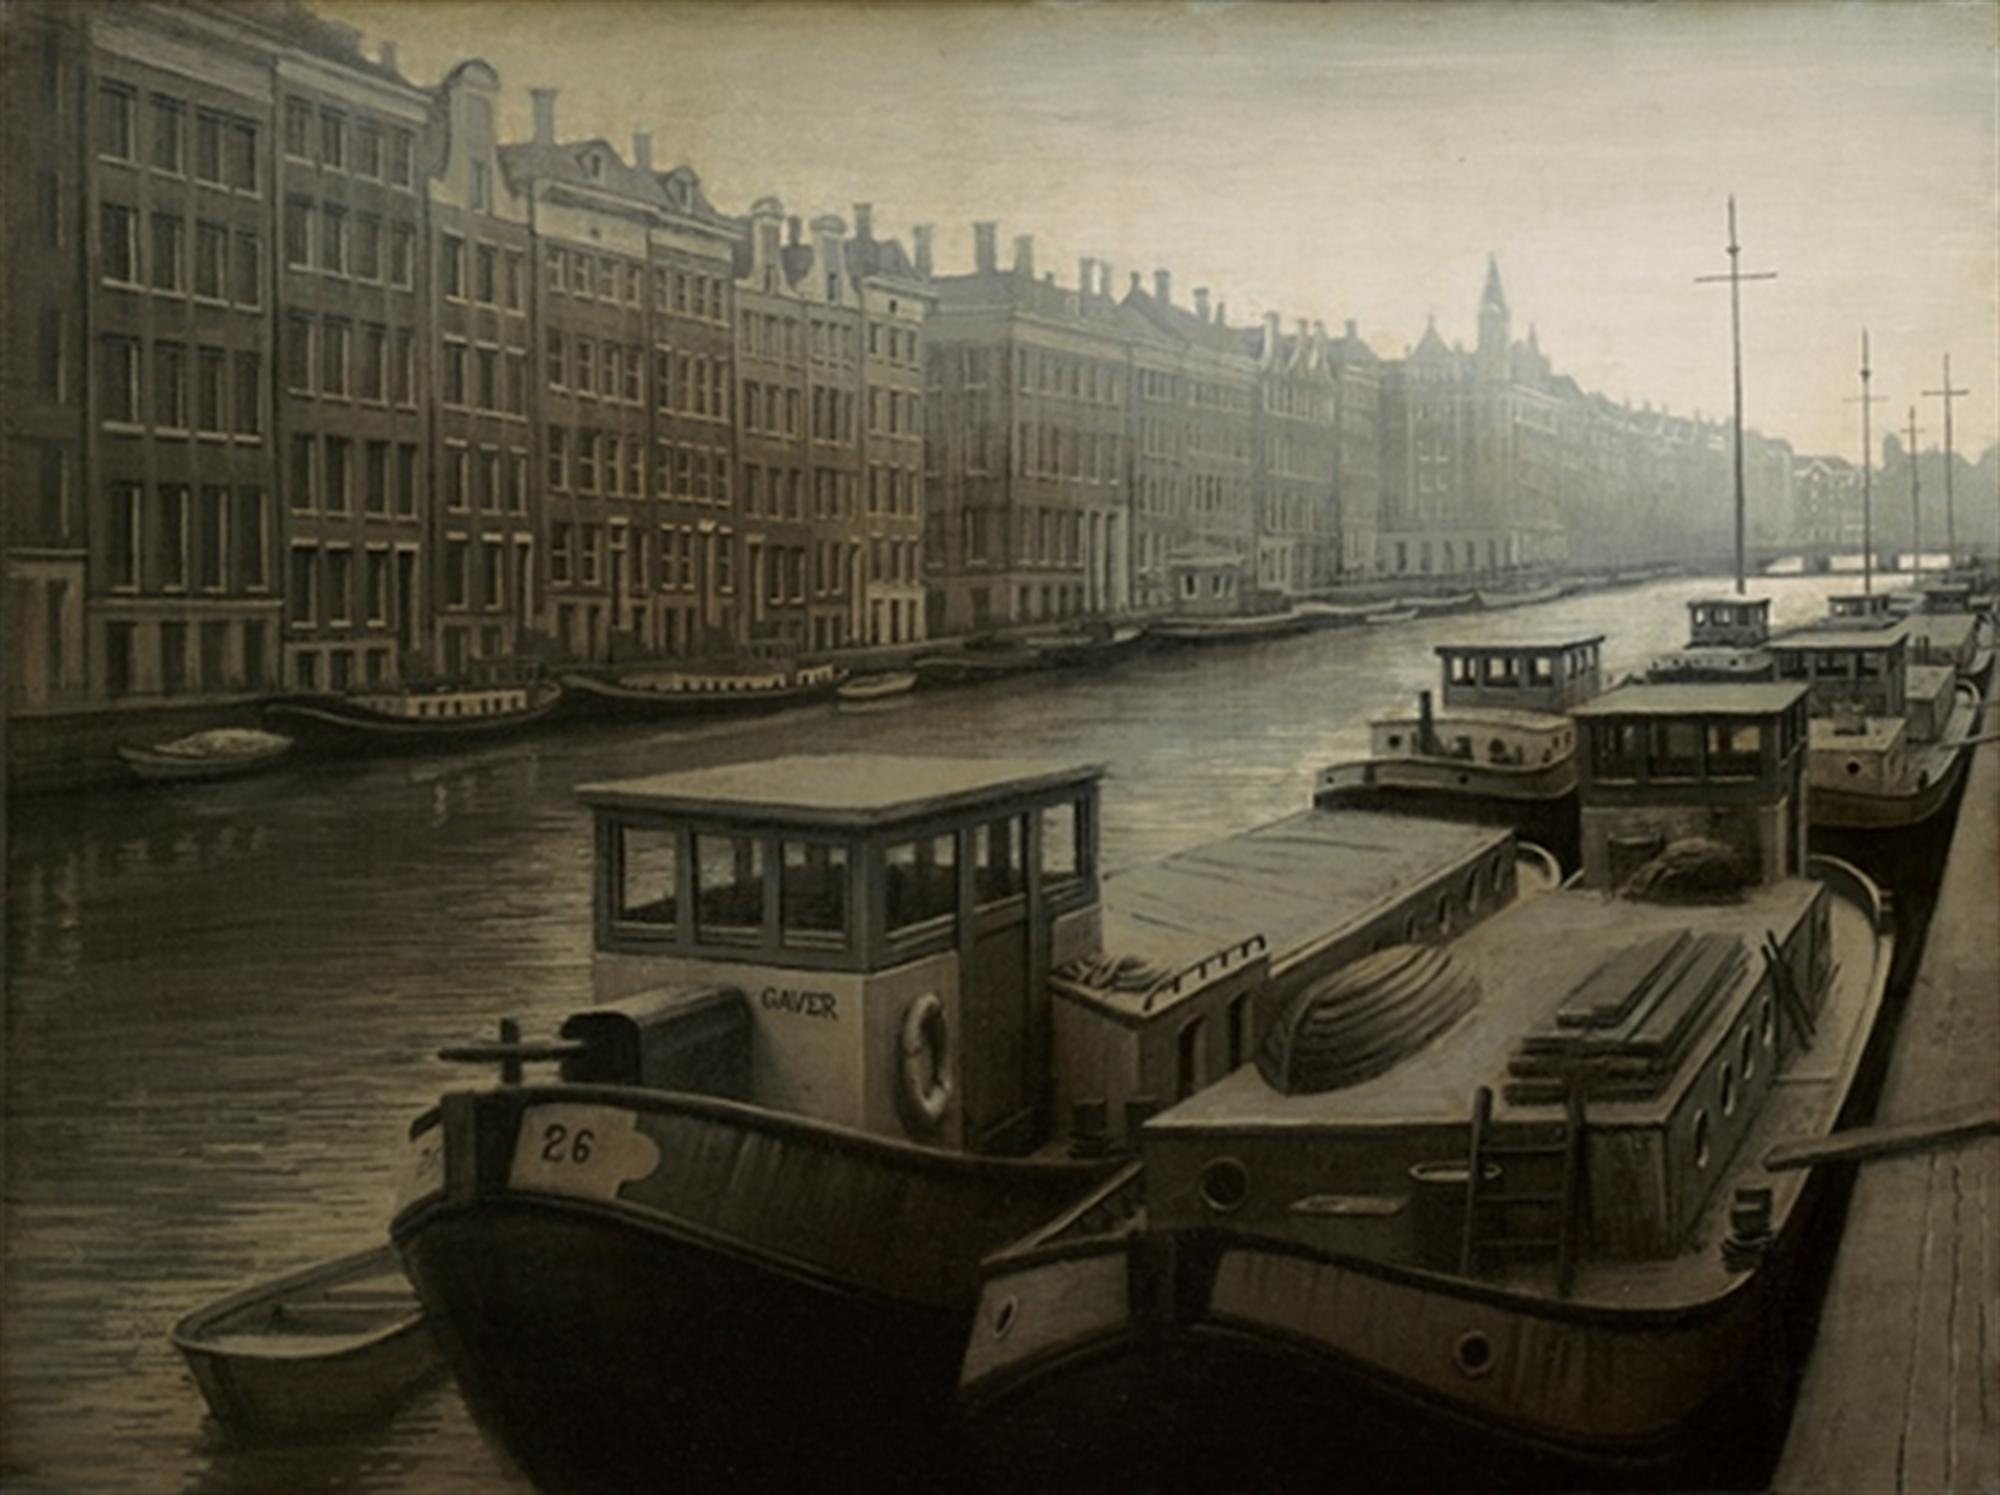 The Glory of Amsterdam by Alexei Butirskiy